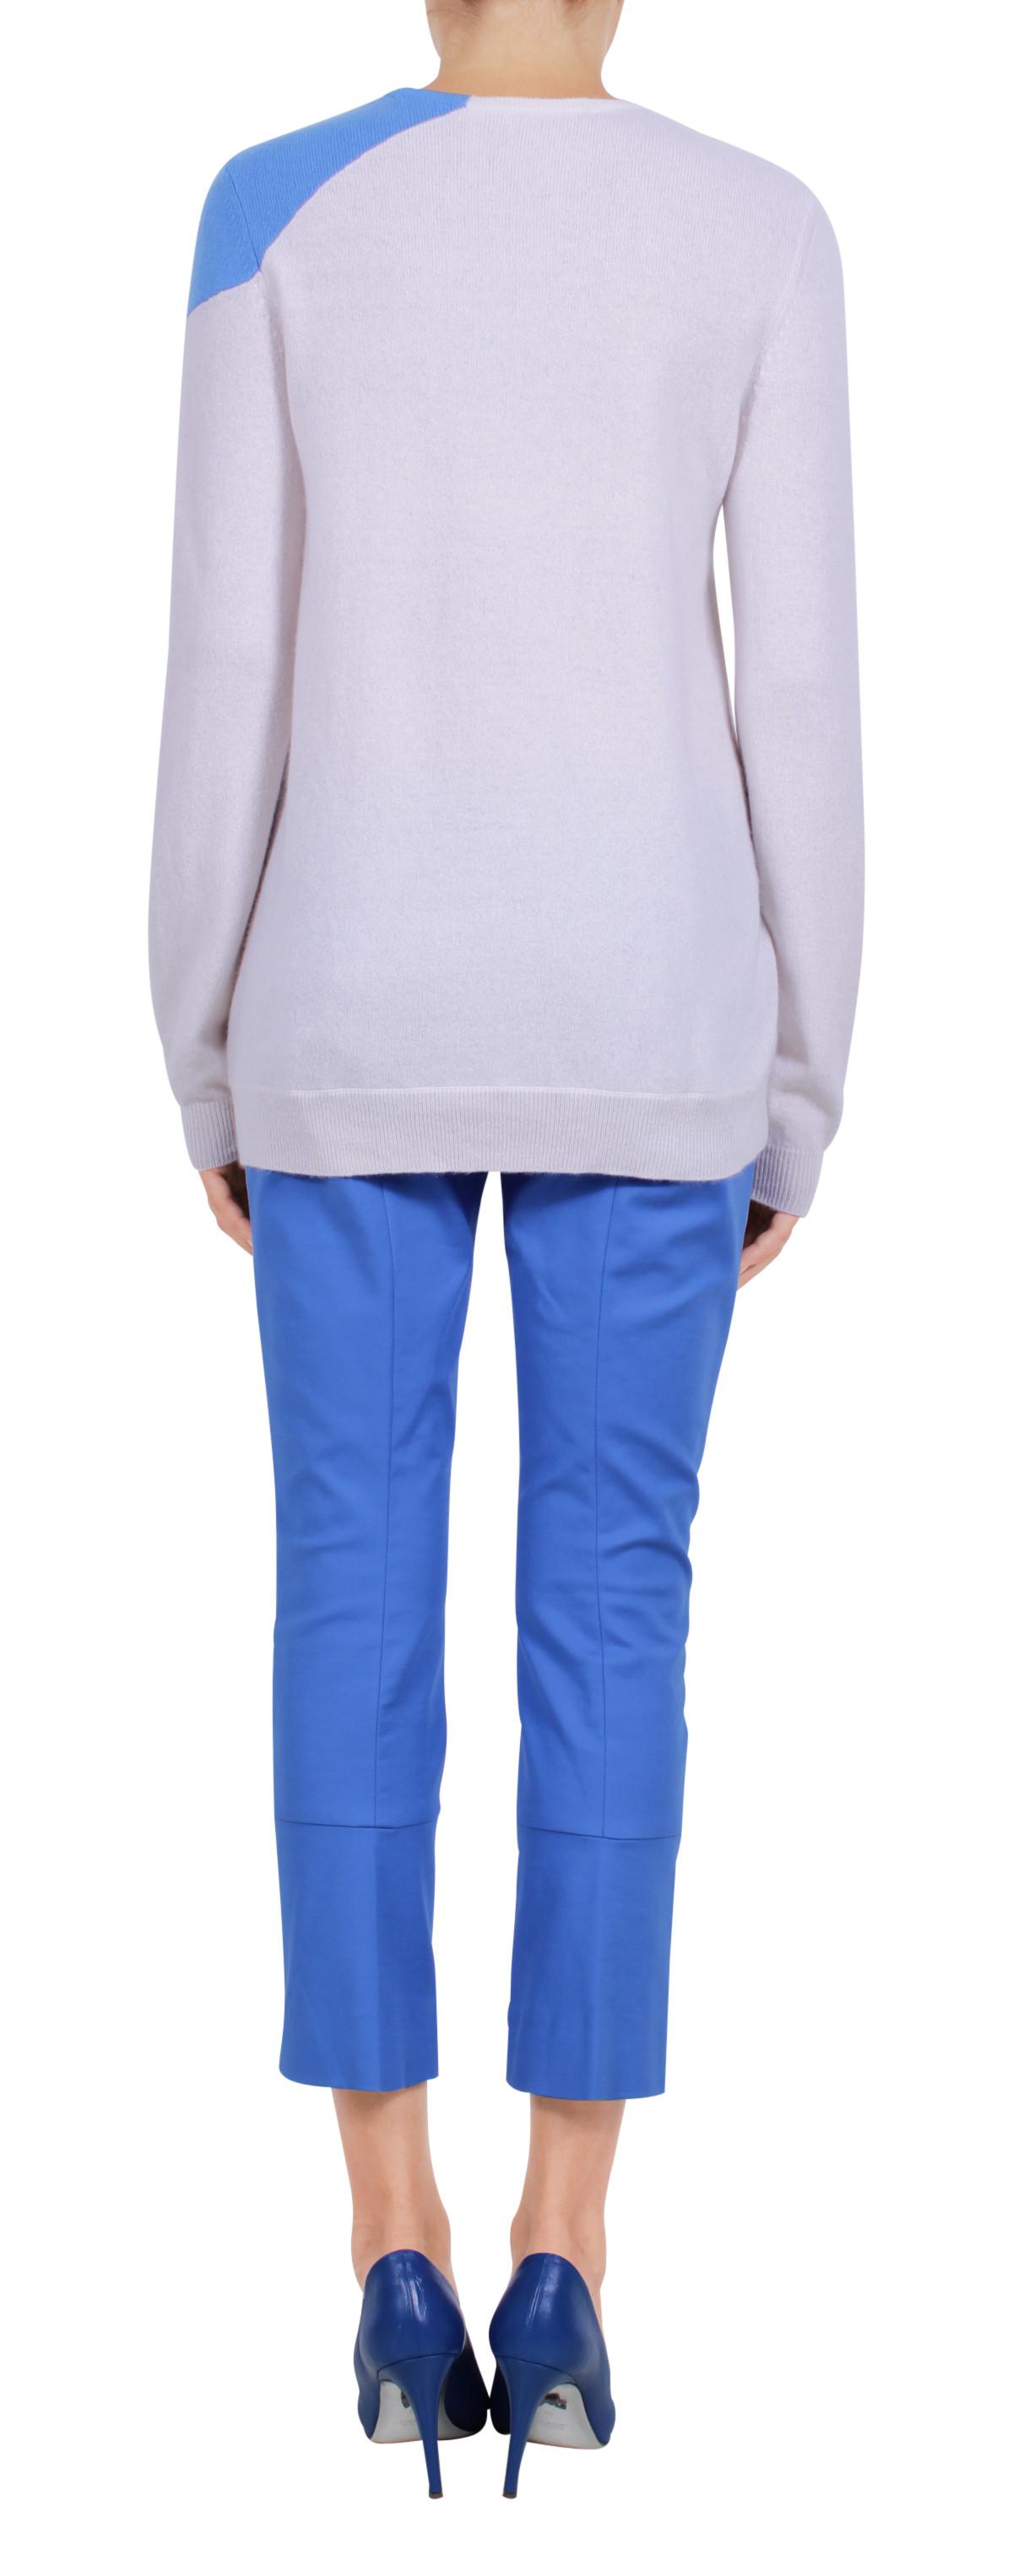 GLAMTASTIC pullover 1/1 - Knit - Shop | SCHUMACHER - Onlineshop